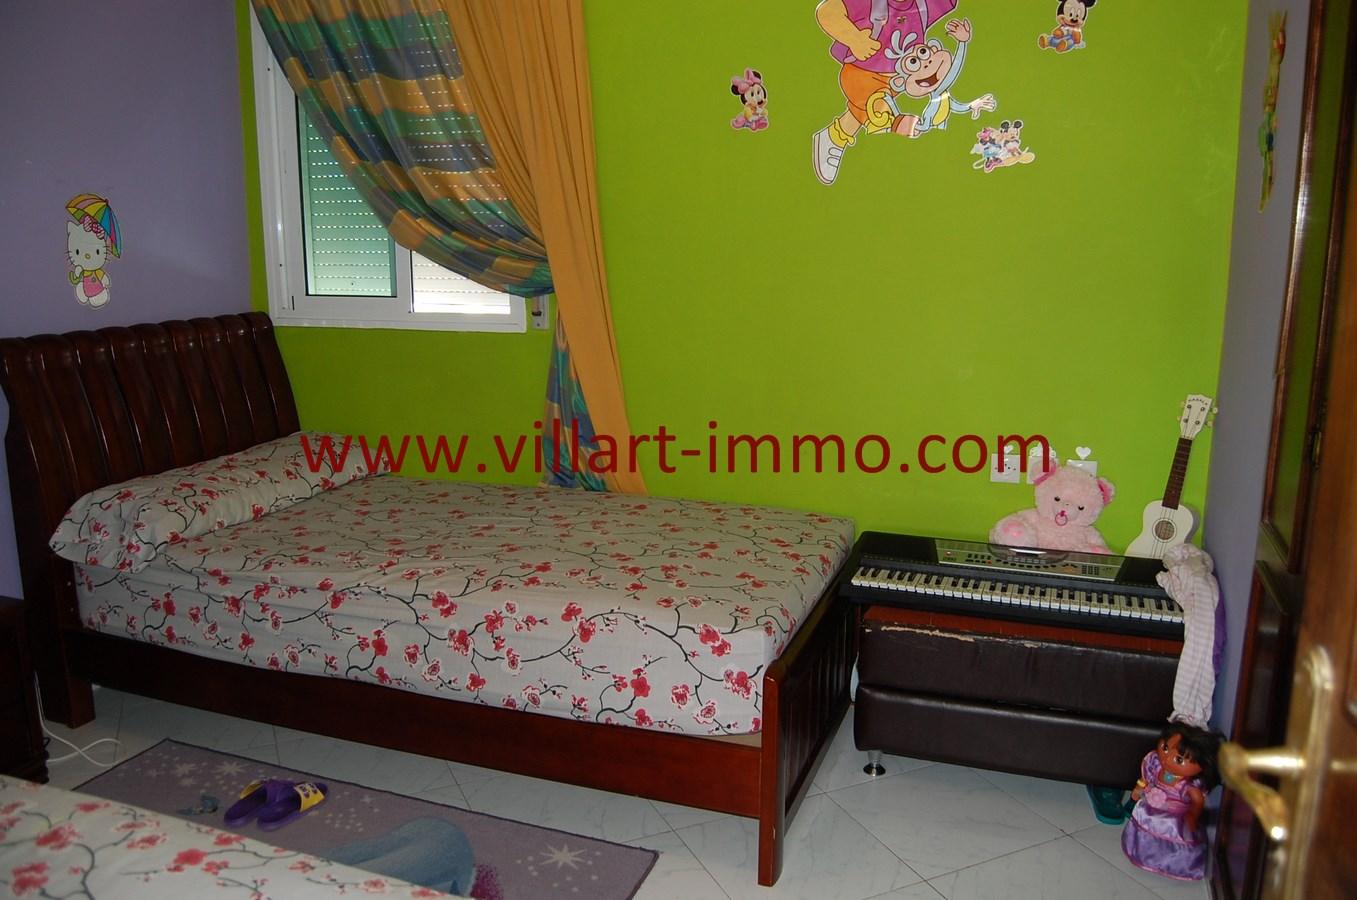 6-Vente-Appartement-Tanger-Centre-Ville-Chambre 2-VA505-Villart Immo